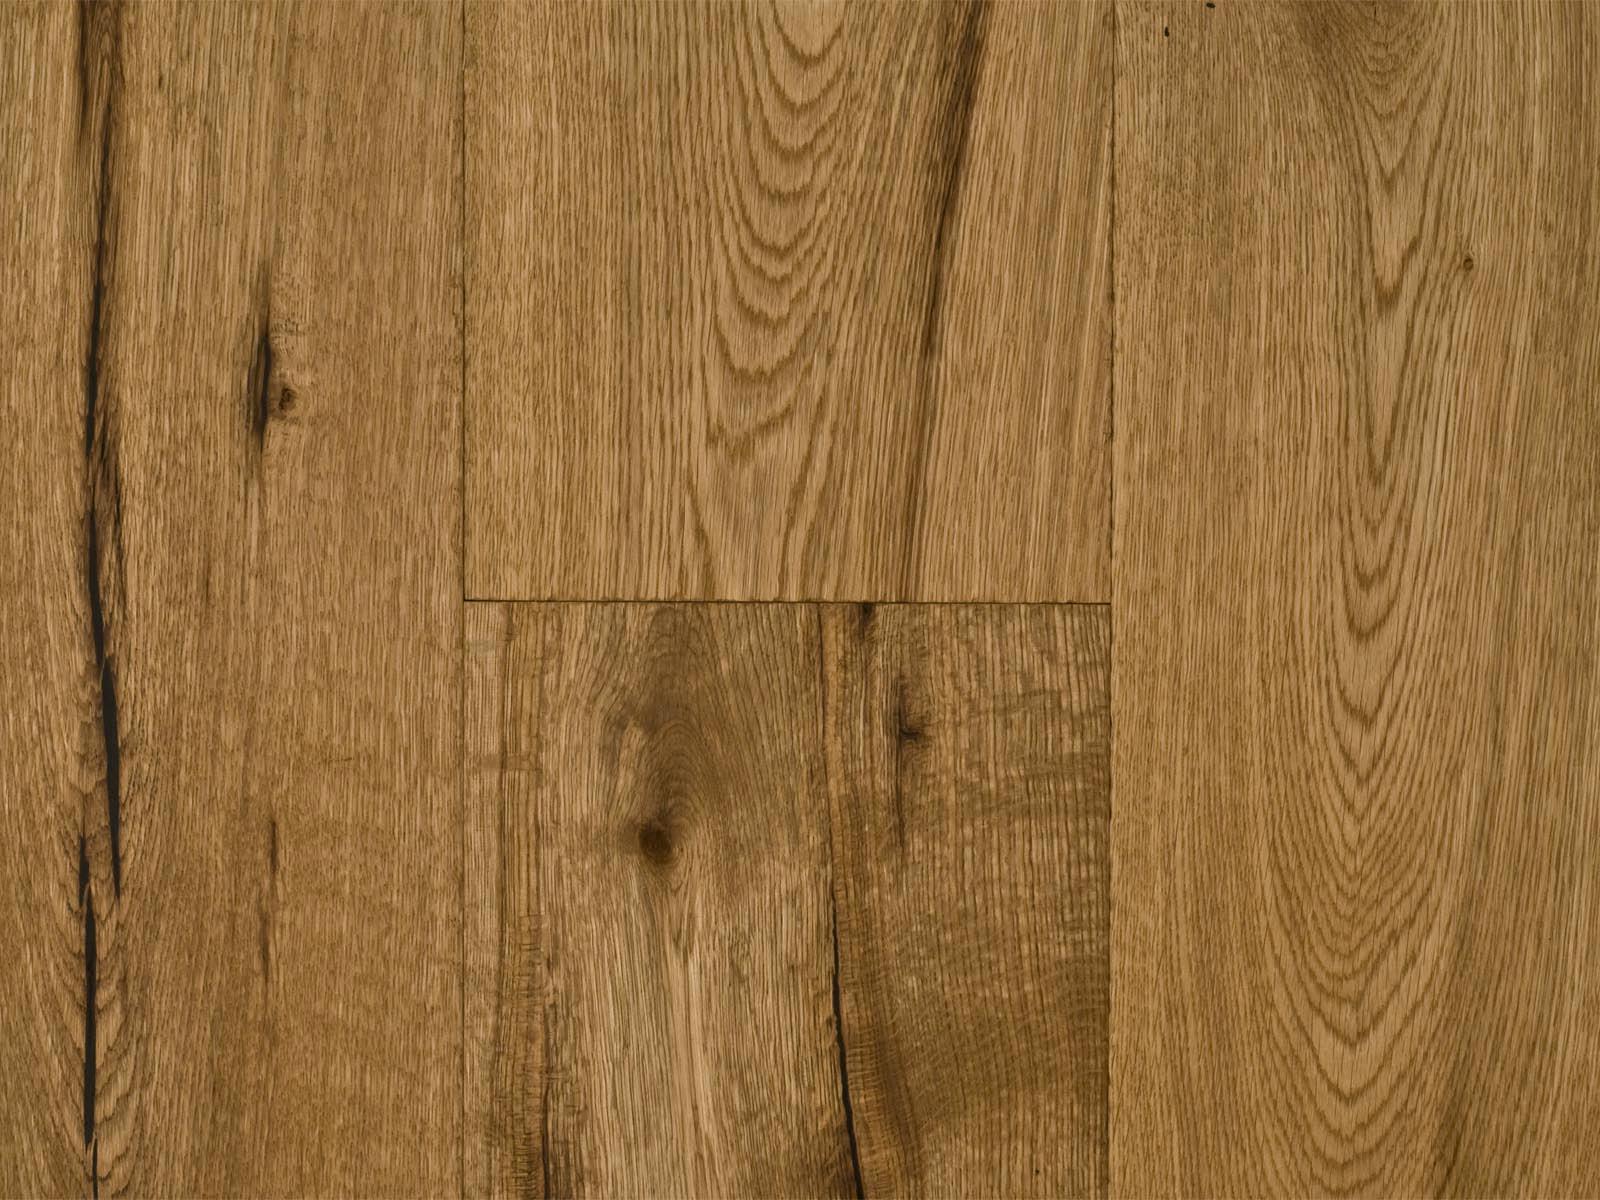 24 Great Jasper Prefinished Oak Hardwood Flooring Reviews 2021 free download jasper prefinished oak hardwood flooring reviews of wlcu page 239 best home design ideas inside du chateau wood flooring elegant duchateau hardwood flooring the chateau